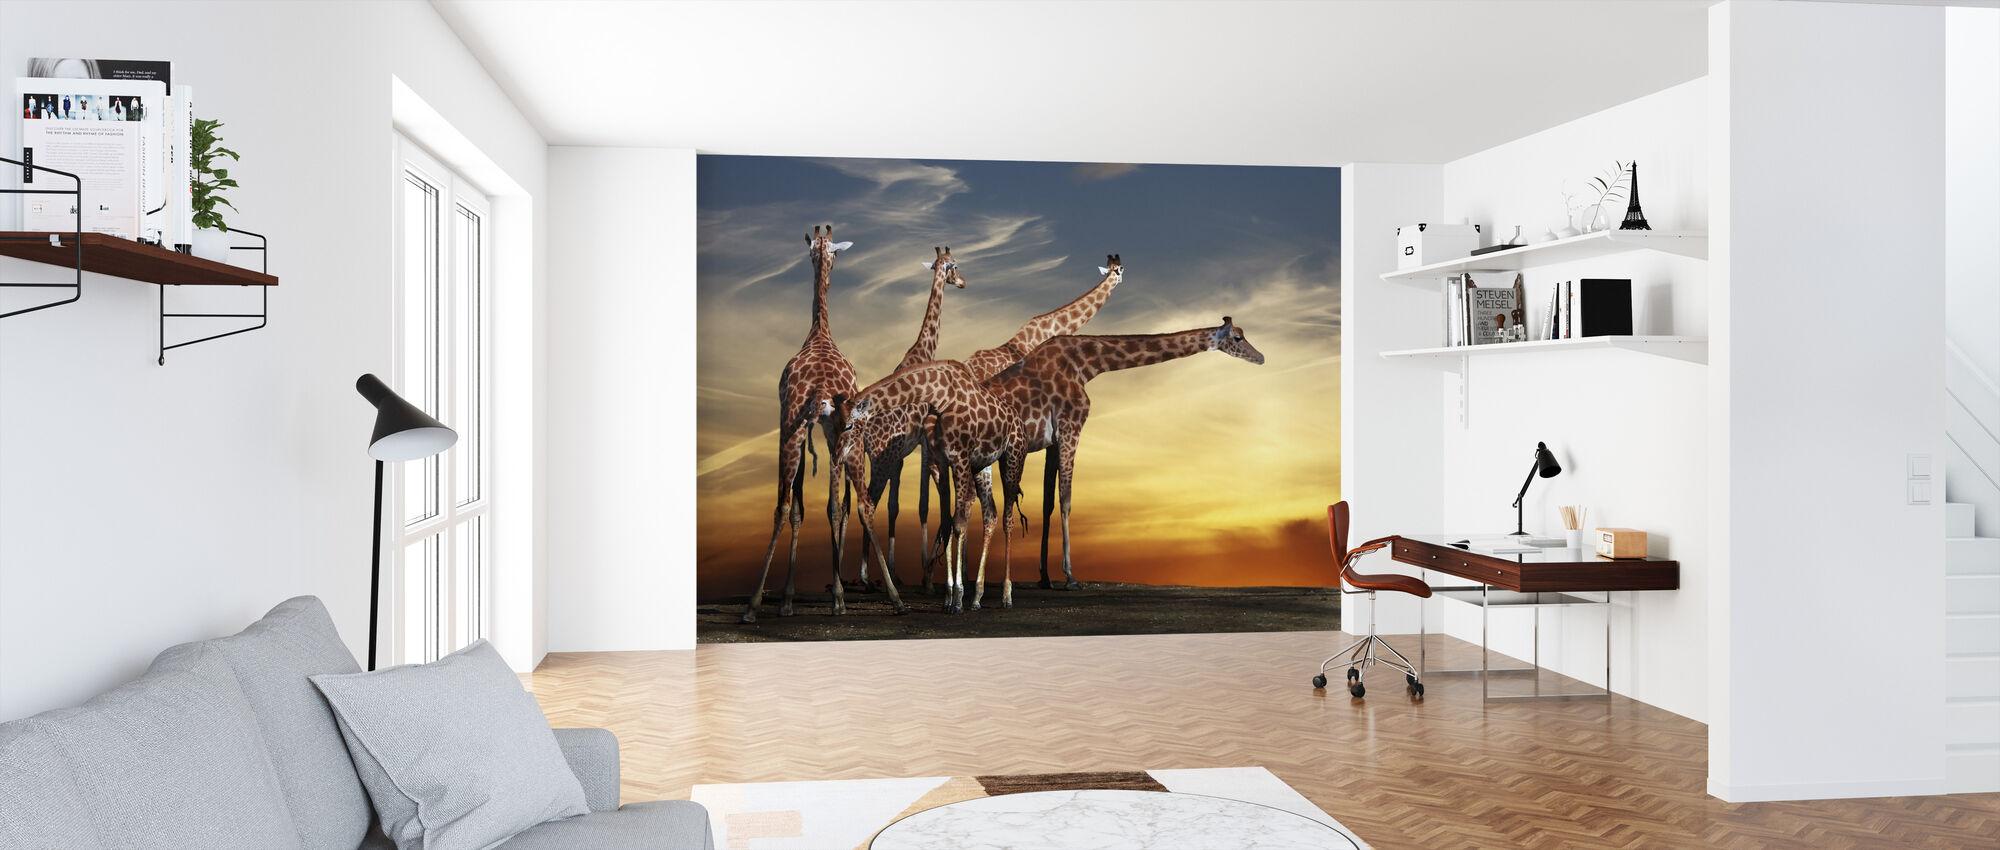 Giraffer och utsikt - Tapet - Kontor